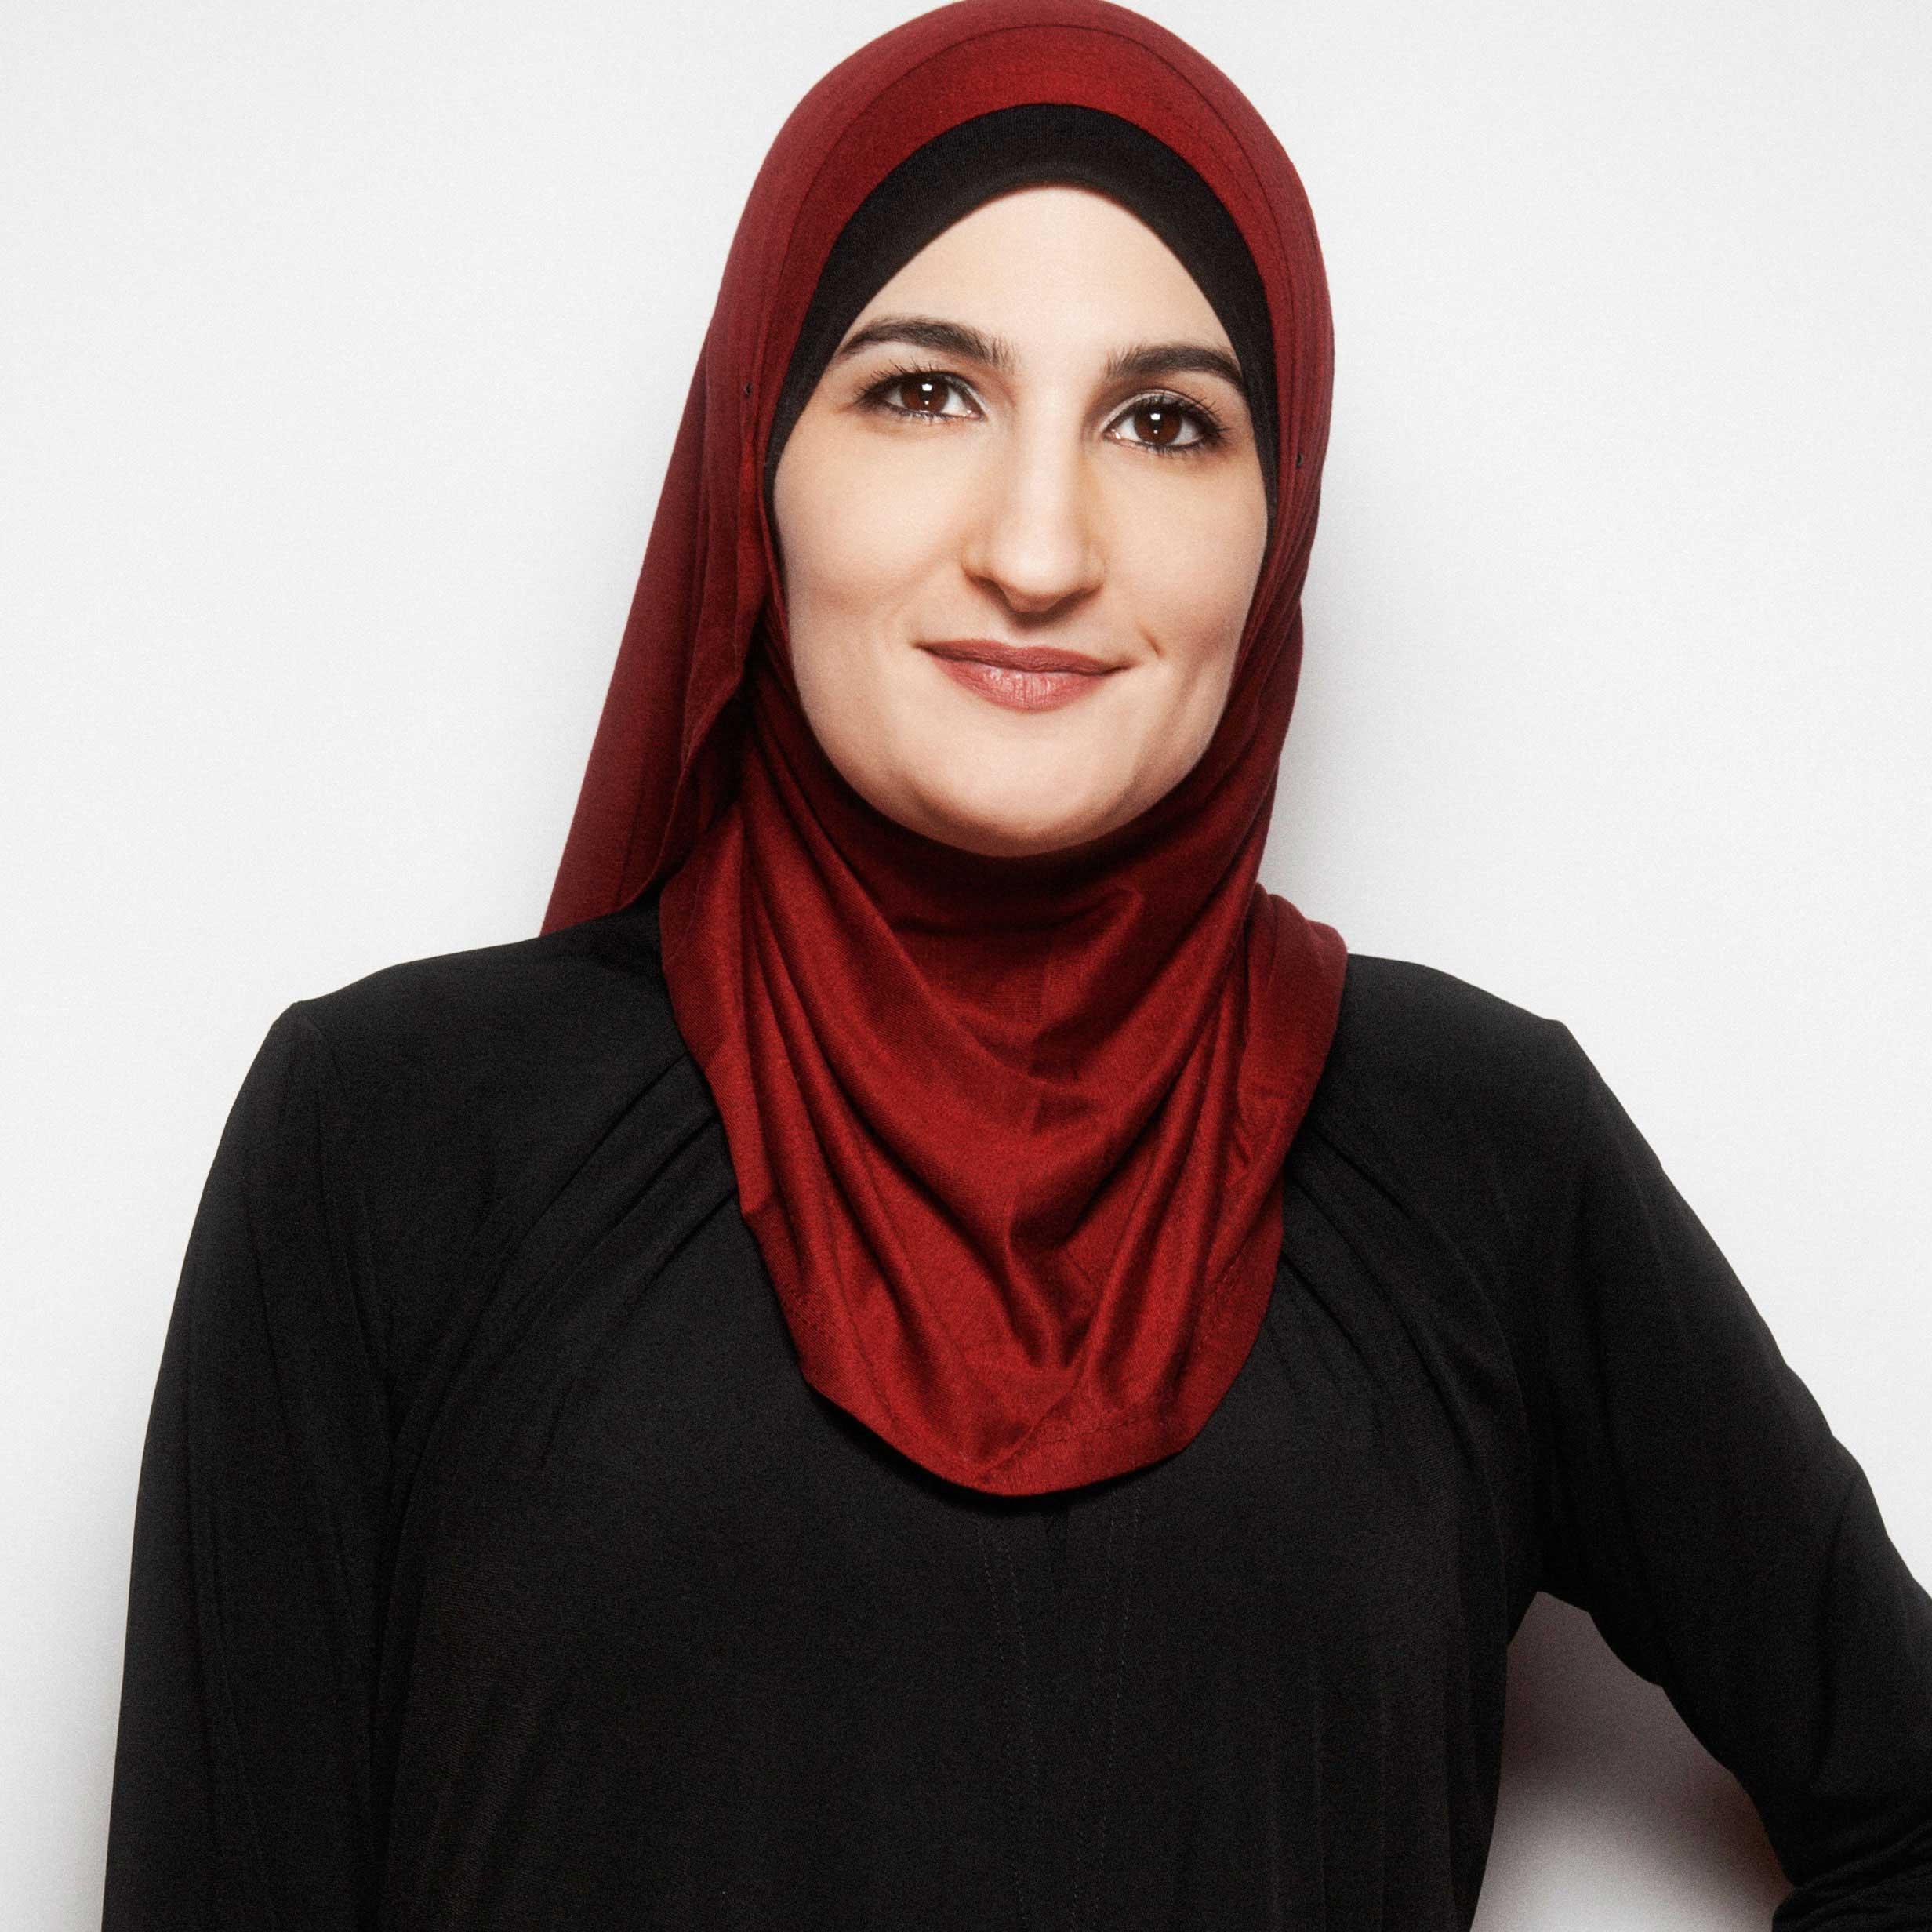 Linda Sarsour Headshot